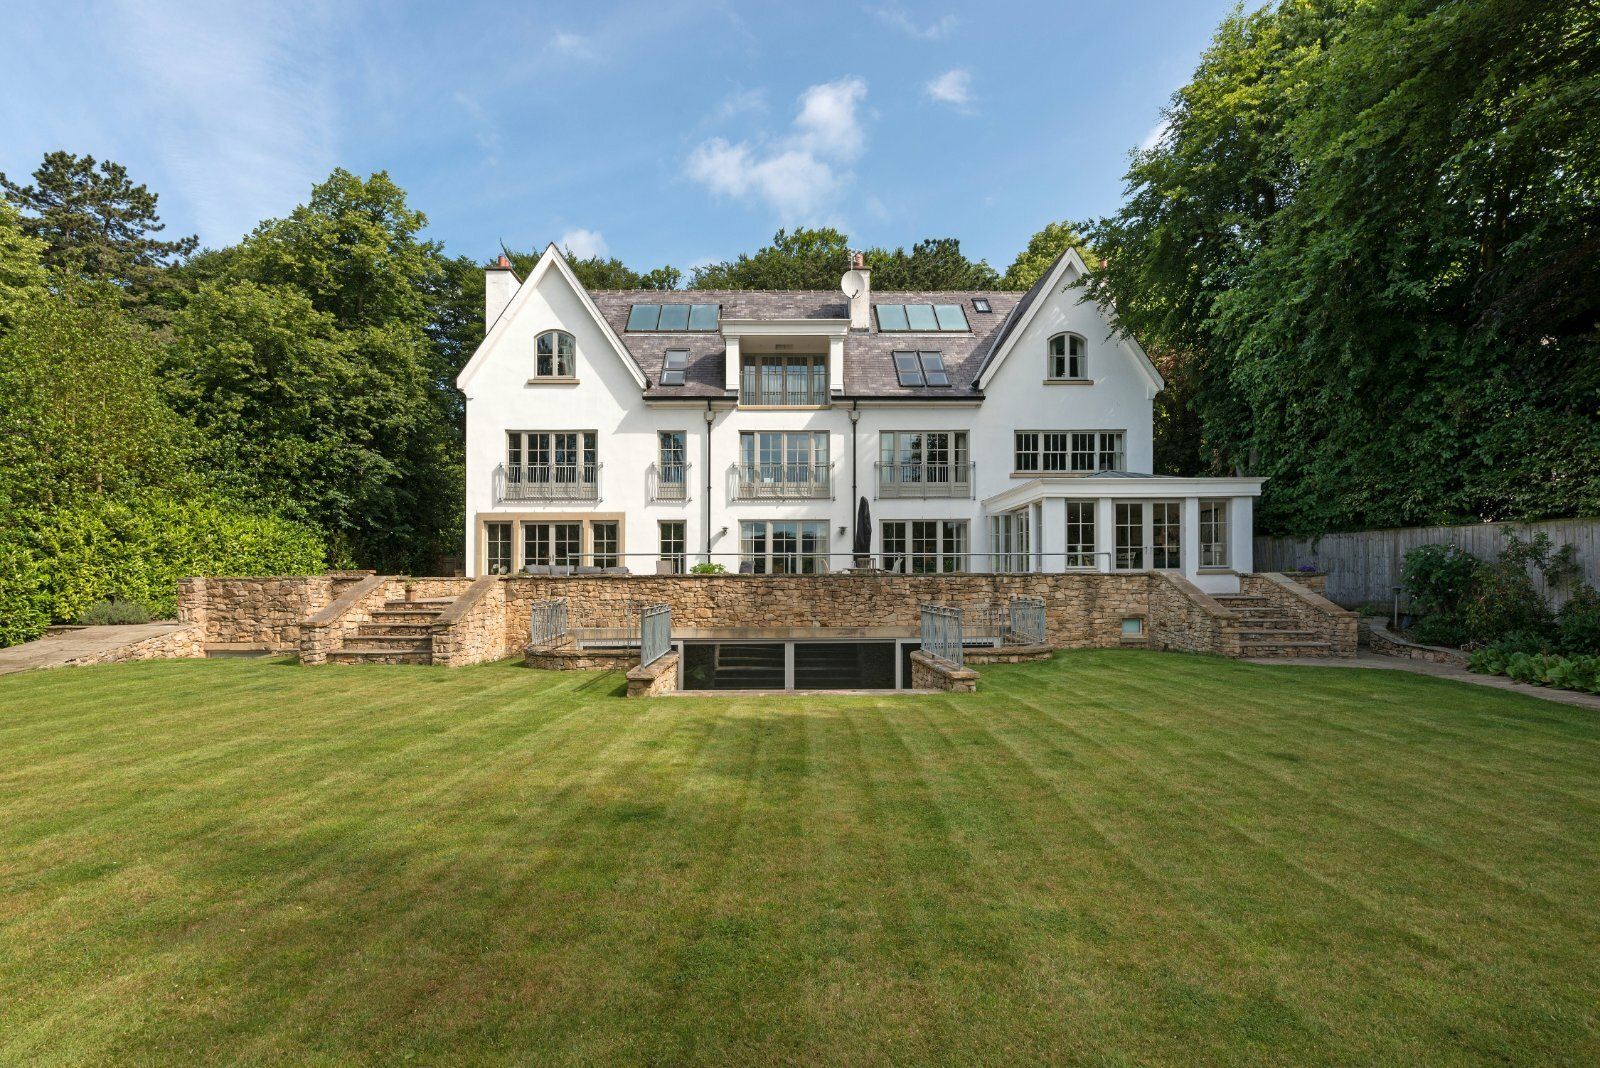 House in Newcastle upon Tyne, England, United Kingdom 1